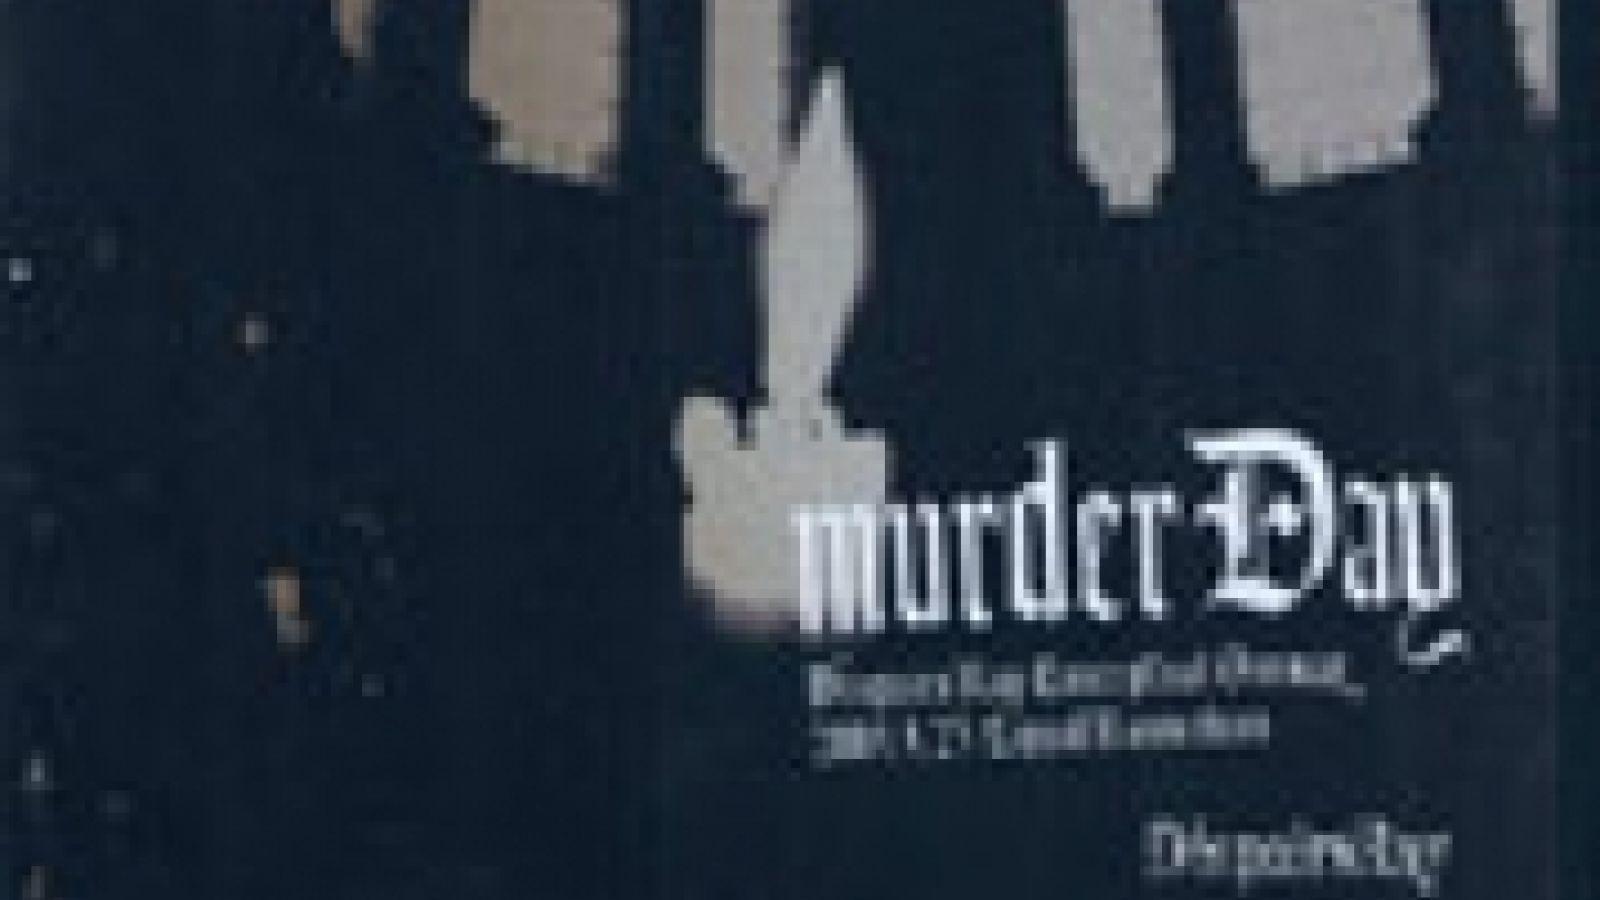 D'espairsRay - murder Day ©